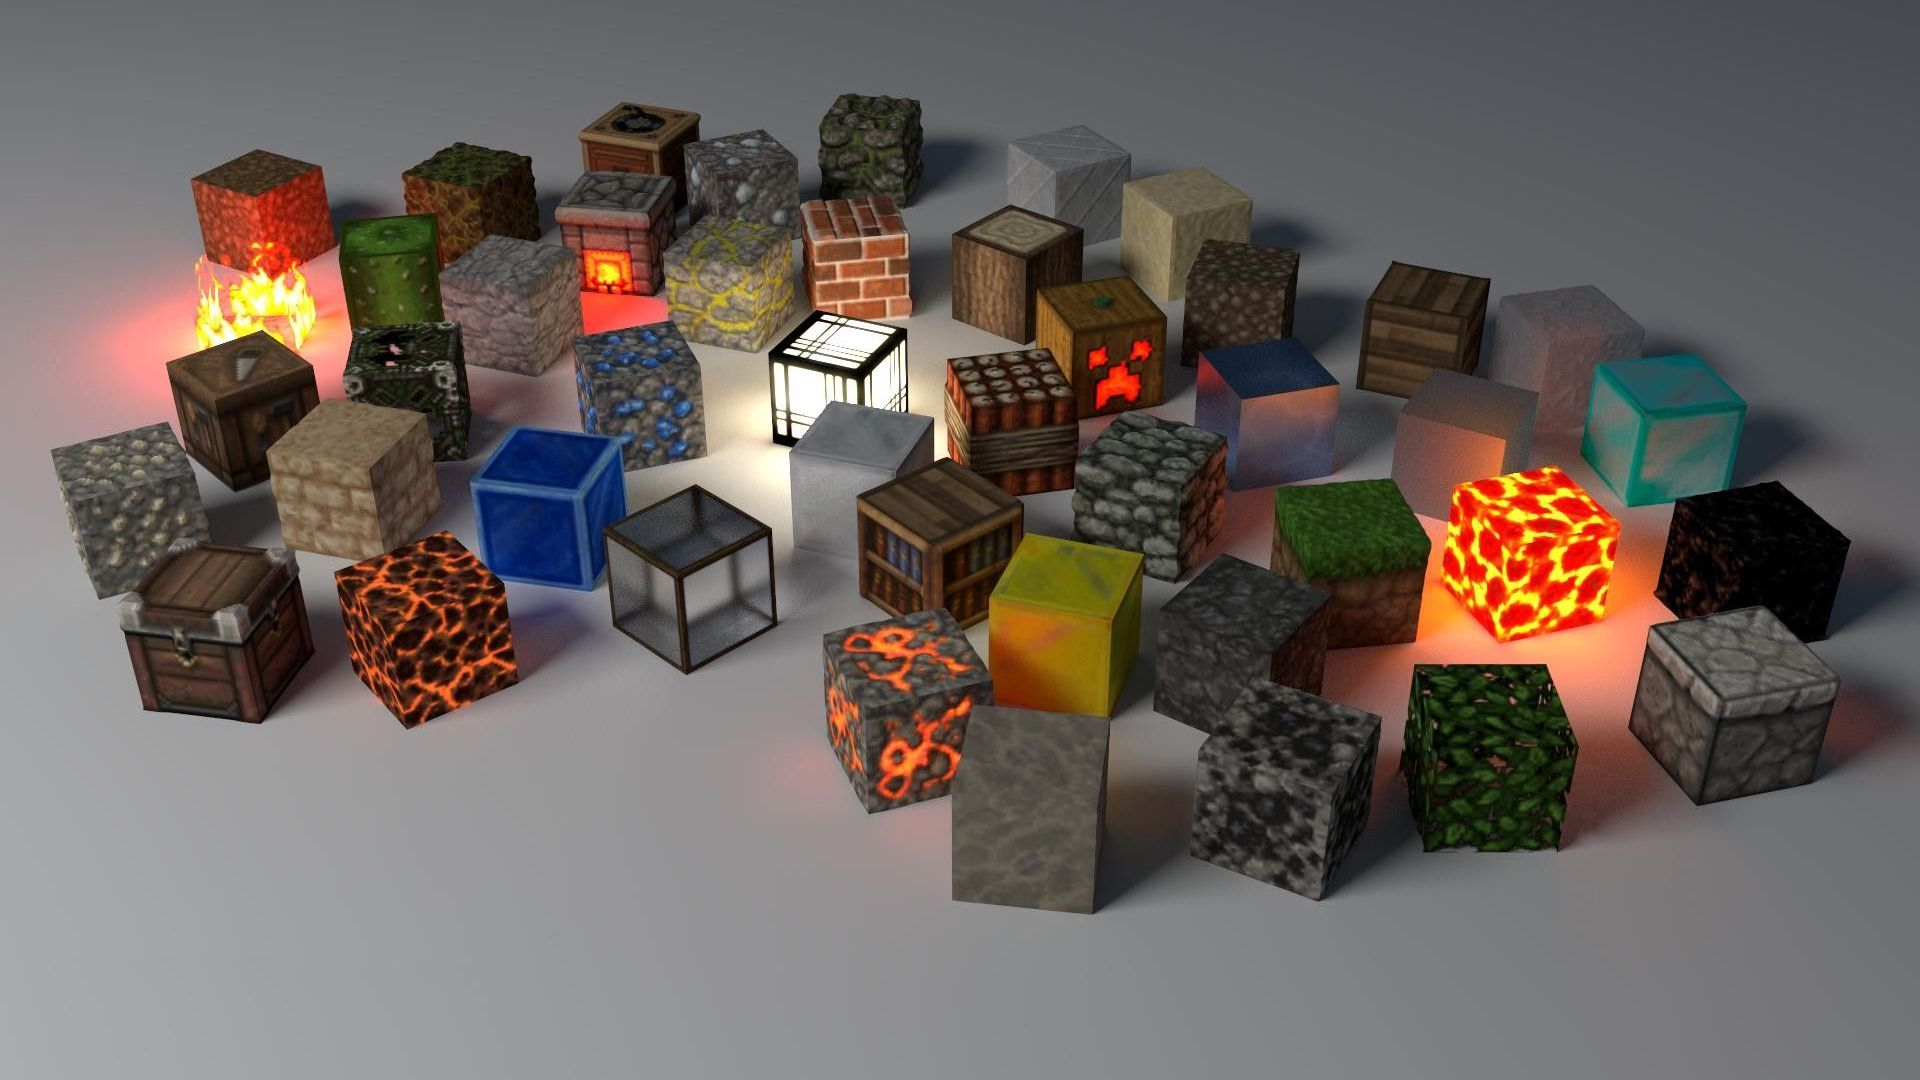 48 Minecraft Wallpapers For Laptop On Wallpapersafari